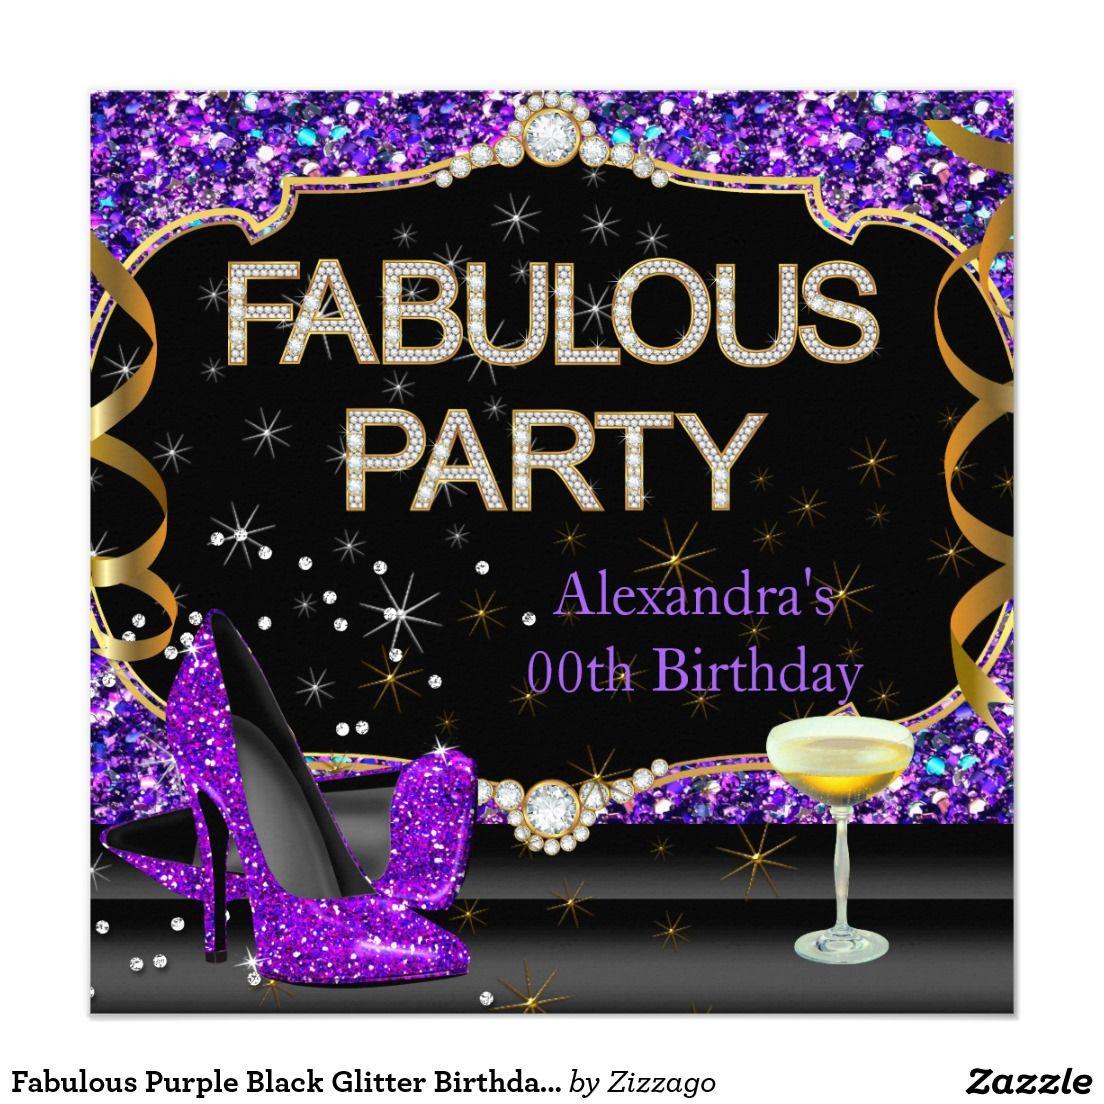 Fabulous purple black glitter birthday party invitation